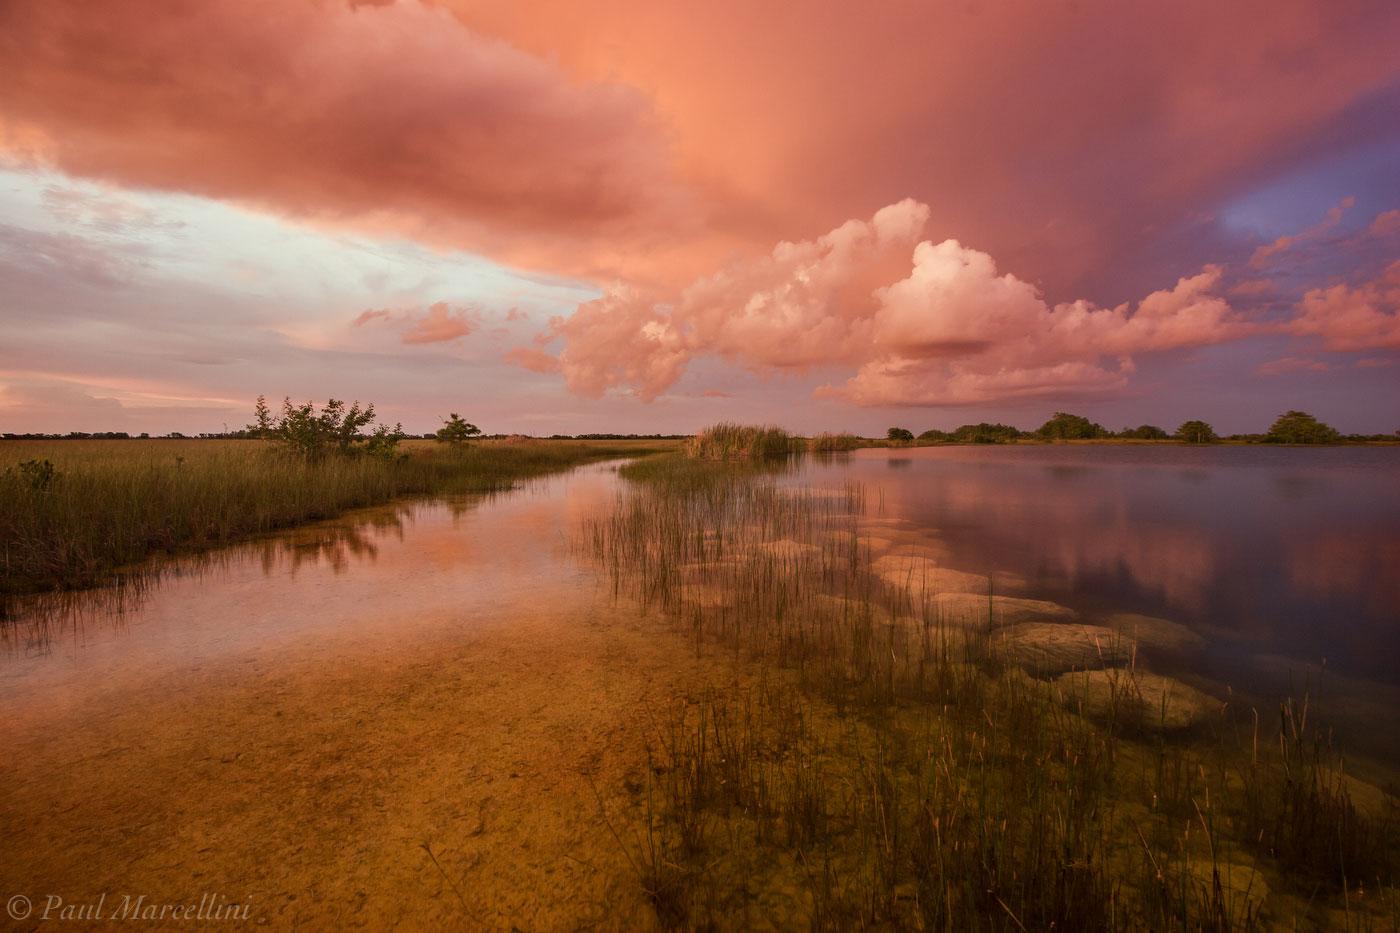 everglades, light, sunset, pond, Florida, nature, photography, florida national parks, photo